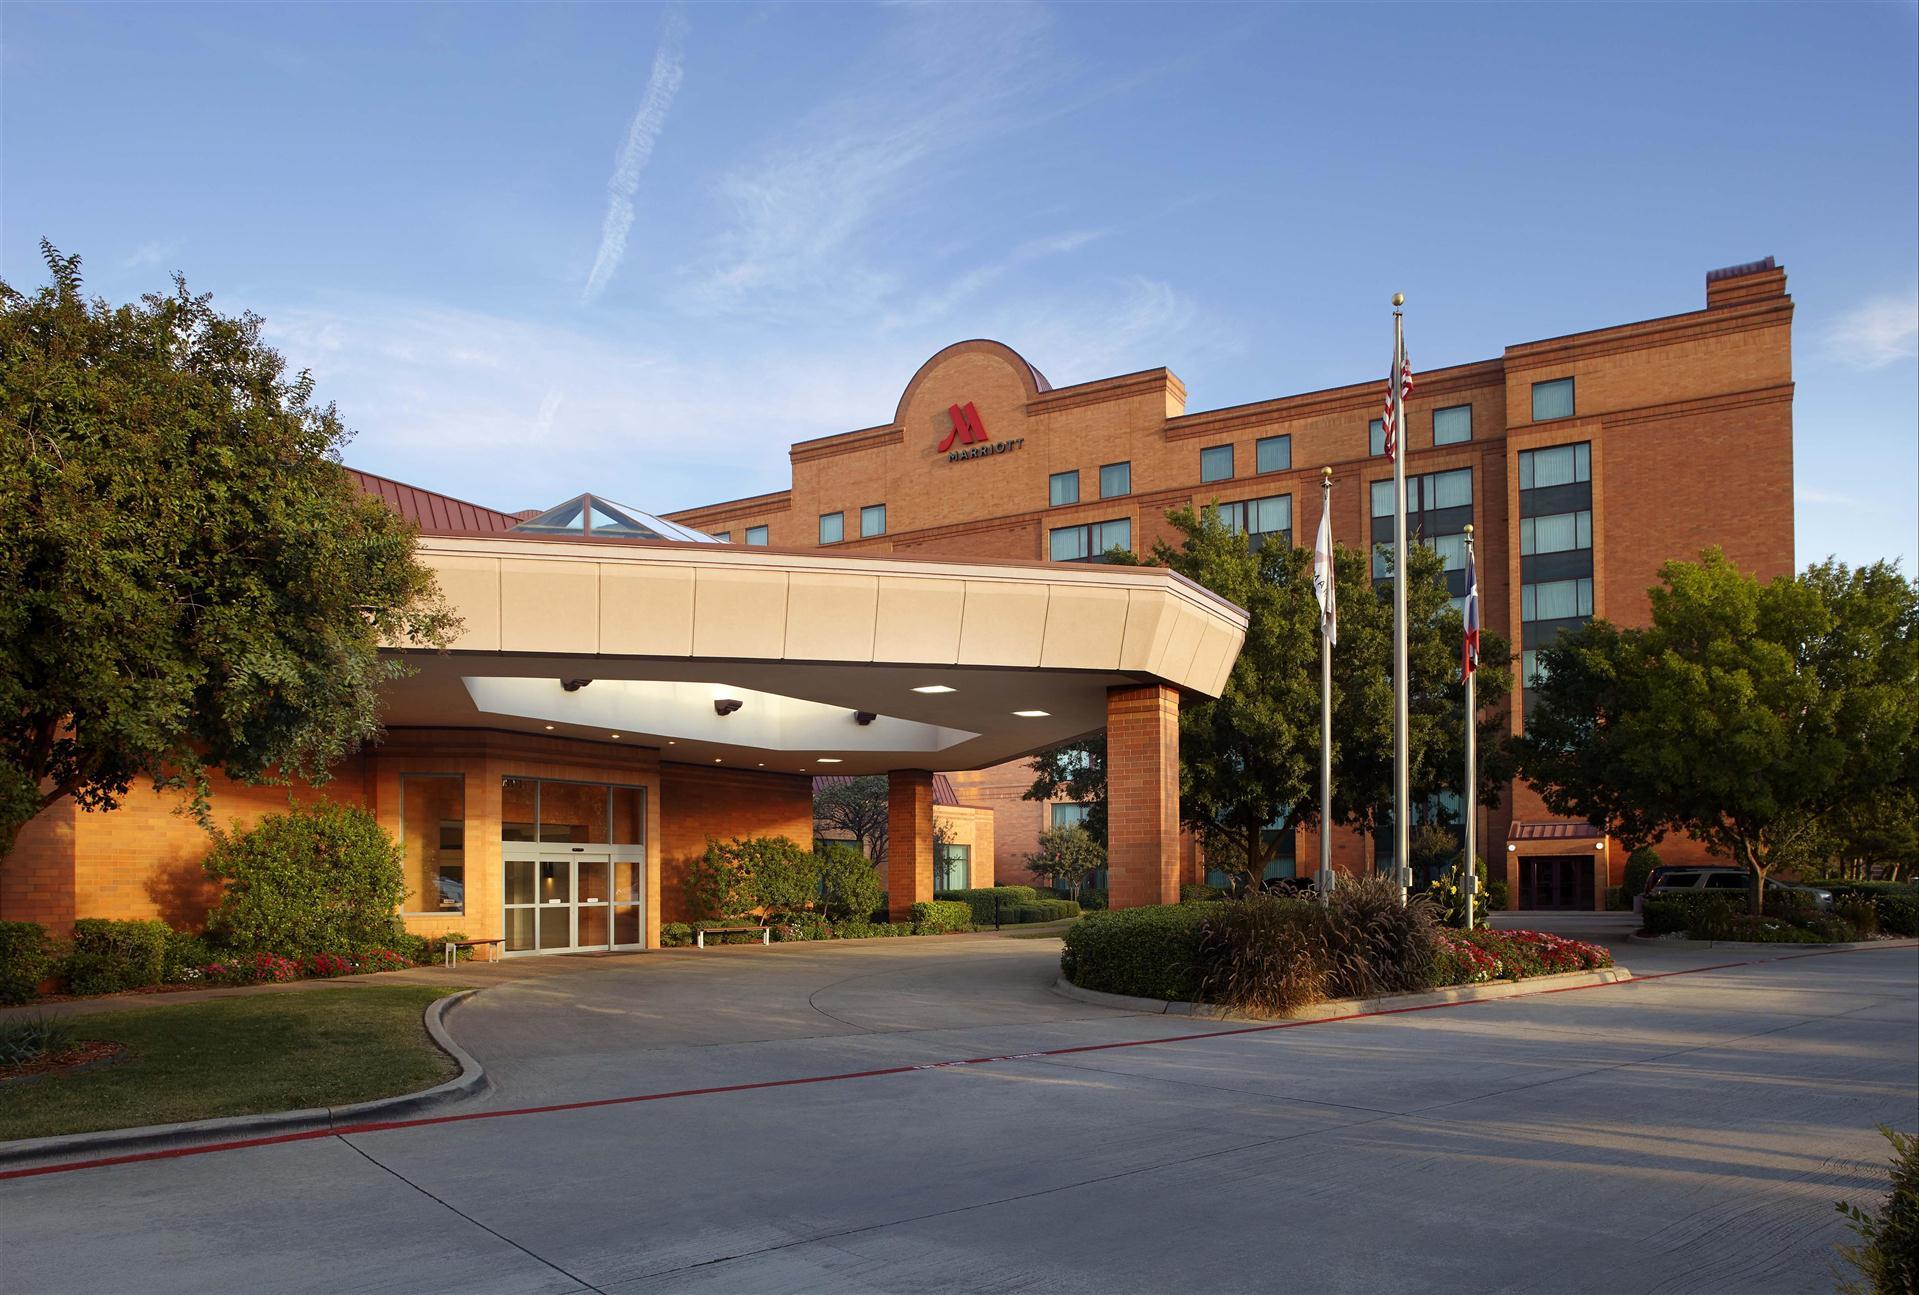 Meetings & Events at Four Seasons Resort and Club Dallas at Las